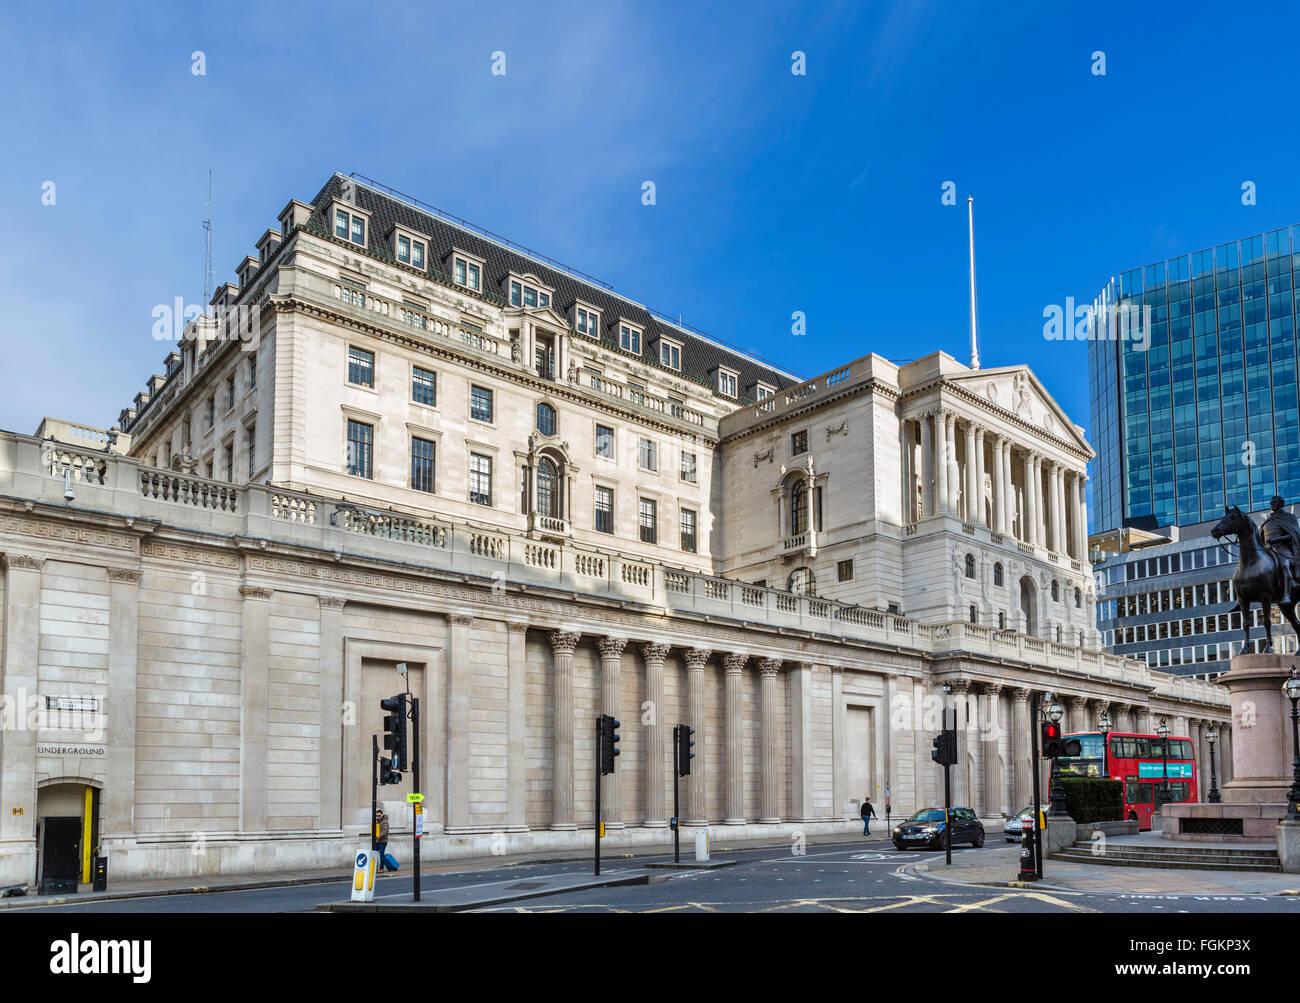 The Bank of England, Threadneedle Street, City of London, London, England, UK - Stock Image